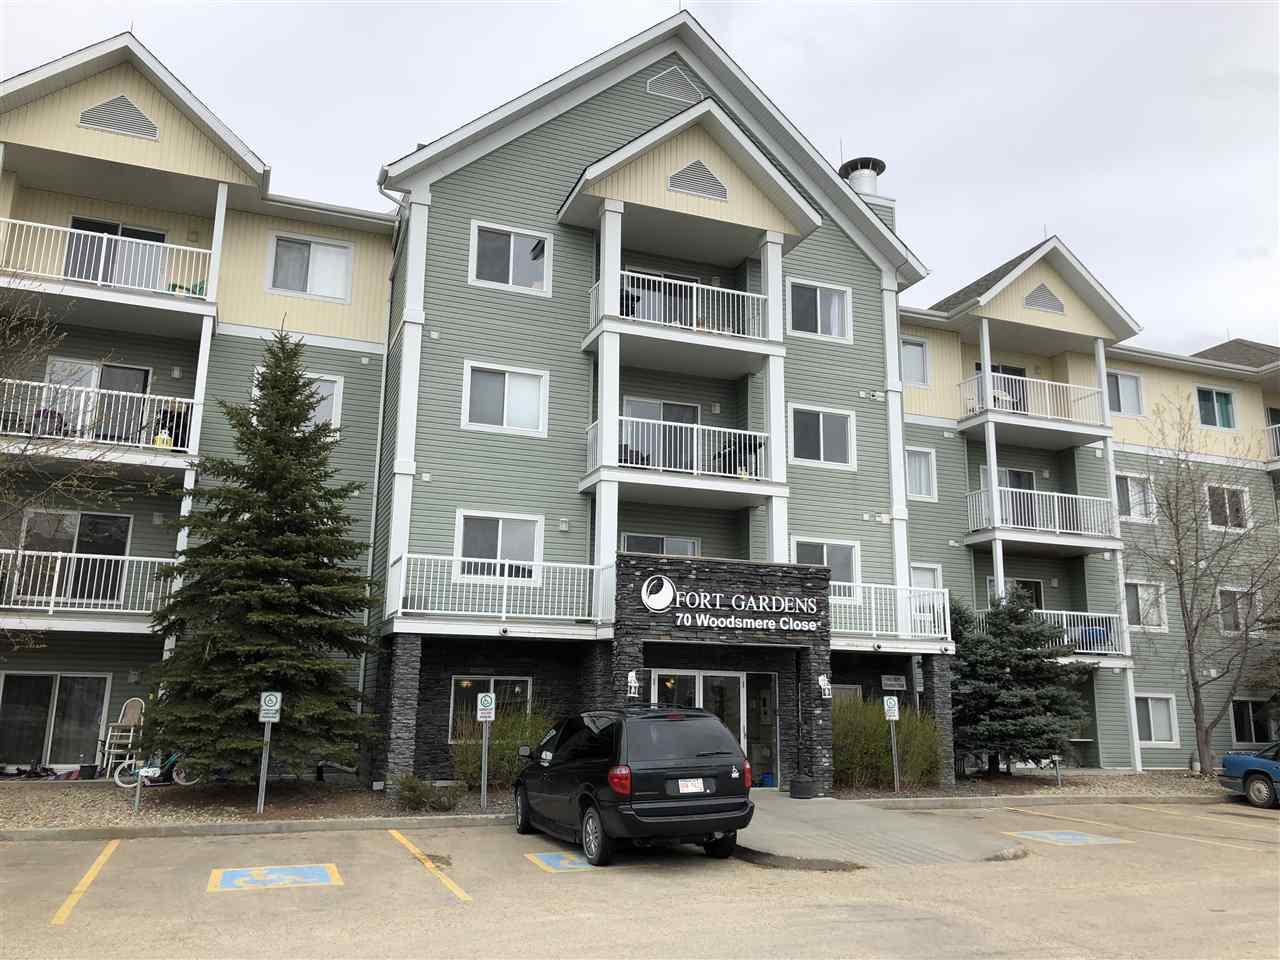 218 70 Woodsmere Close, Fort Saskatchewan, MLS® # E4157017